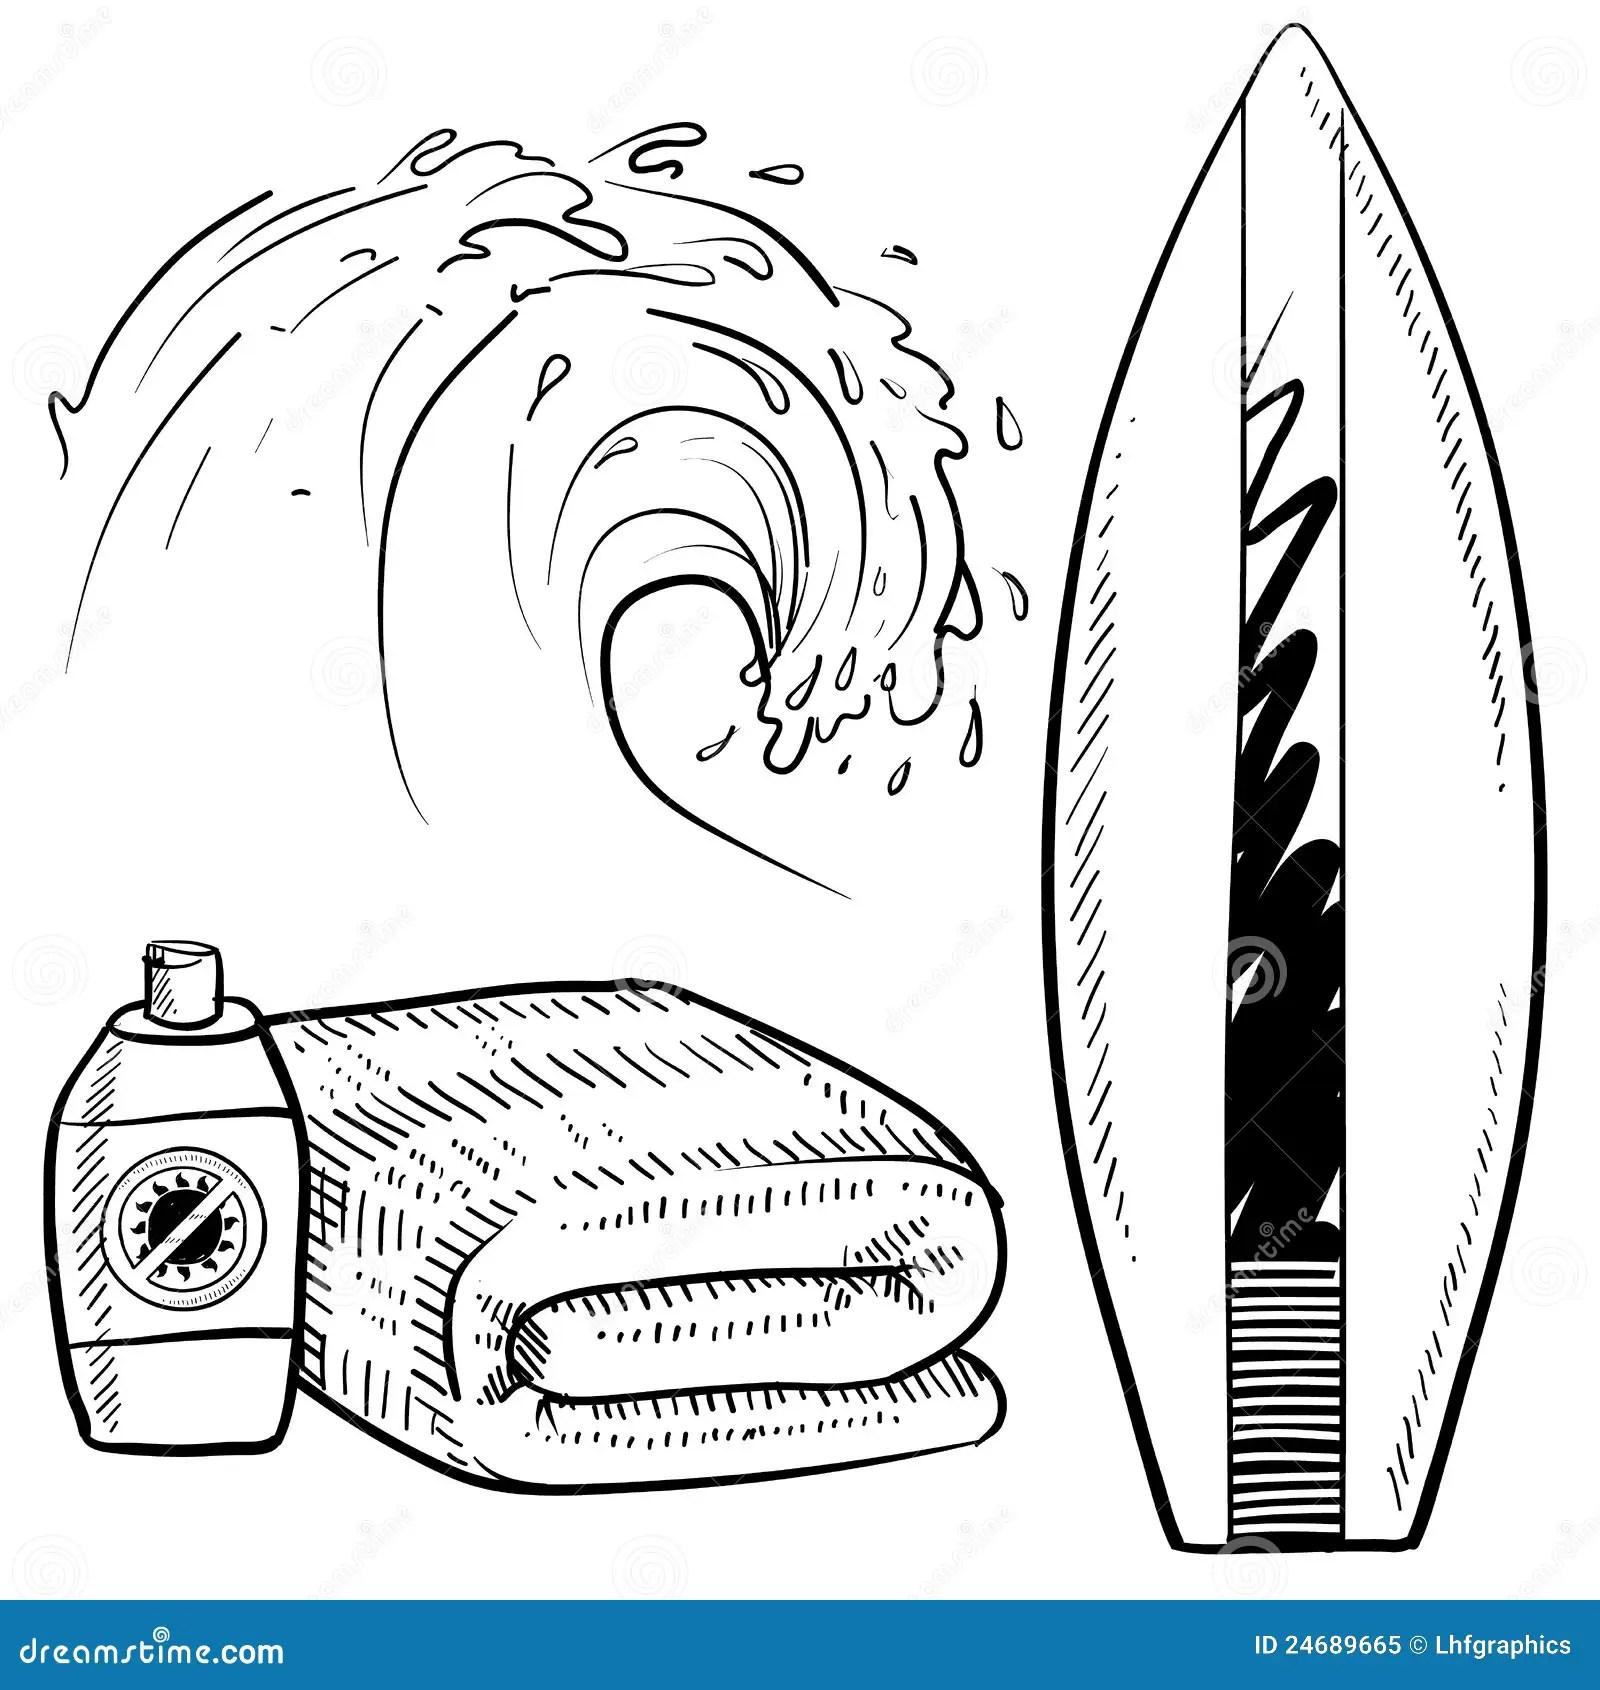 Surfing Equipment Sketch Stock Vector Illustration Of